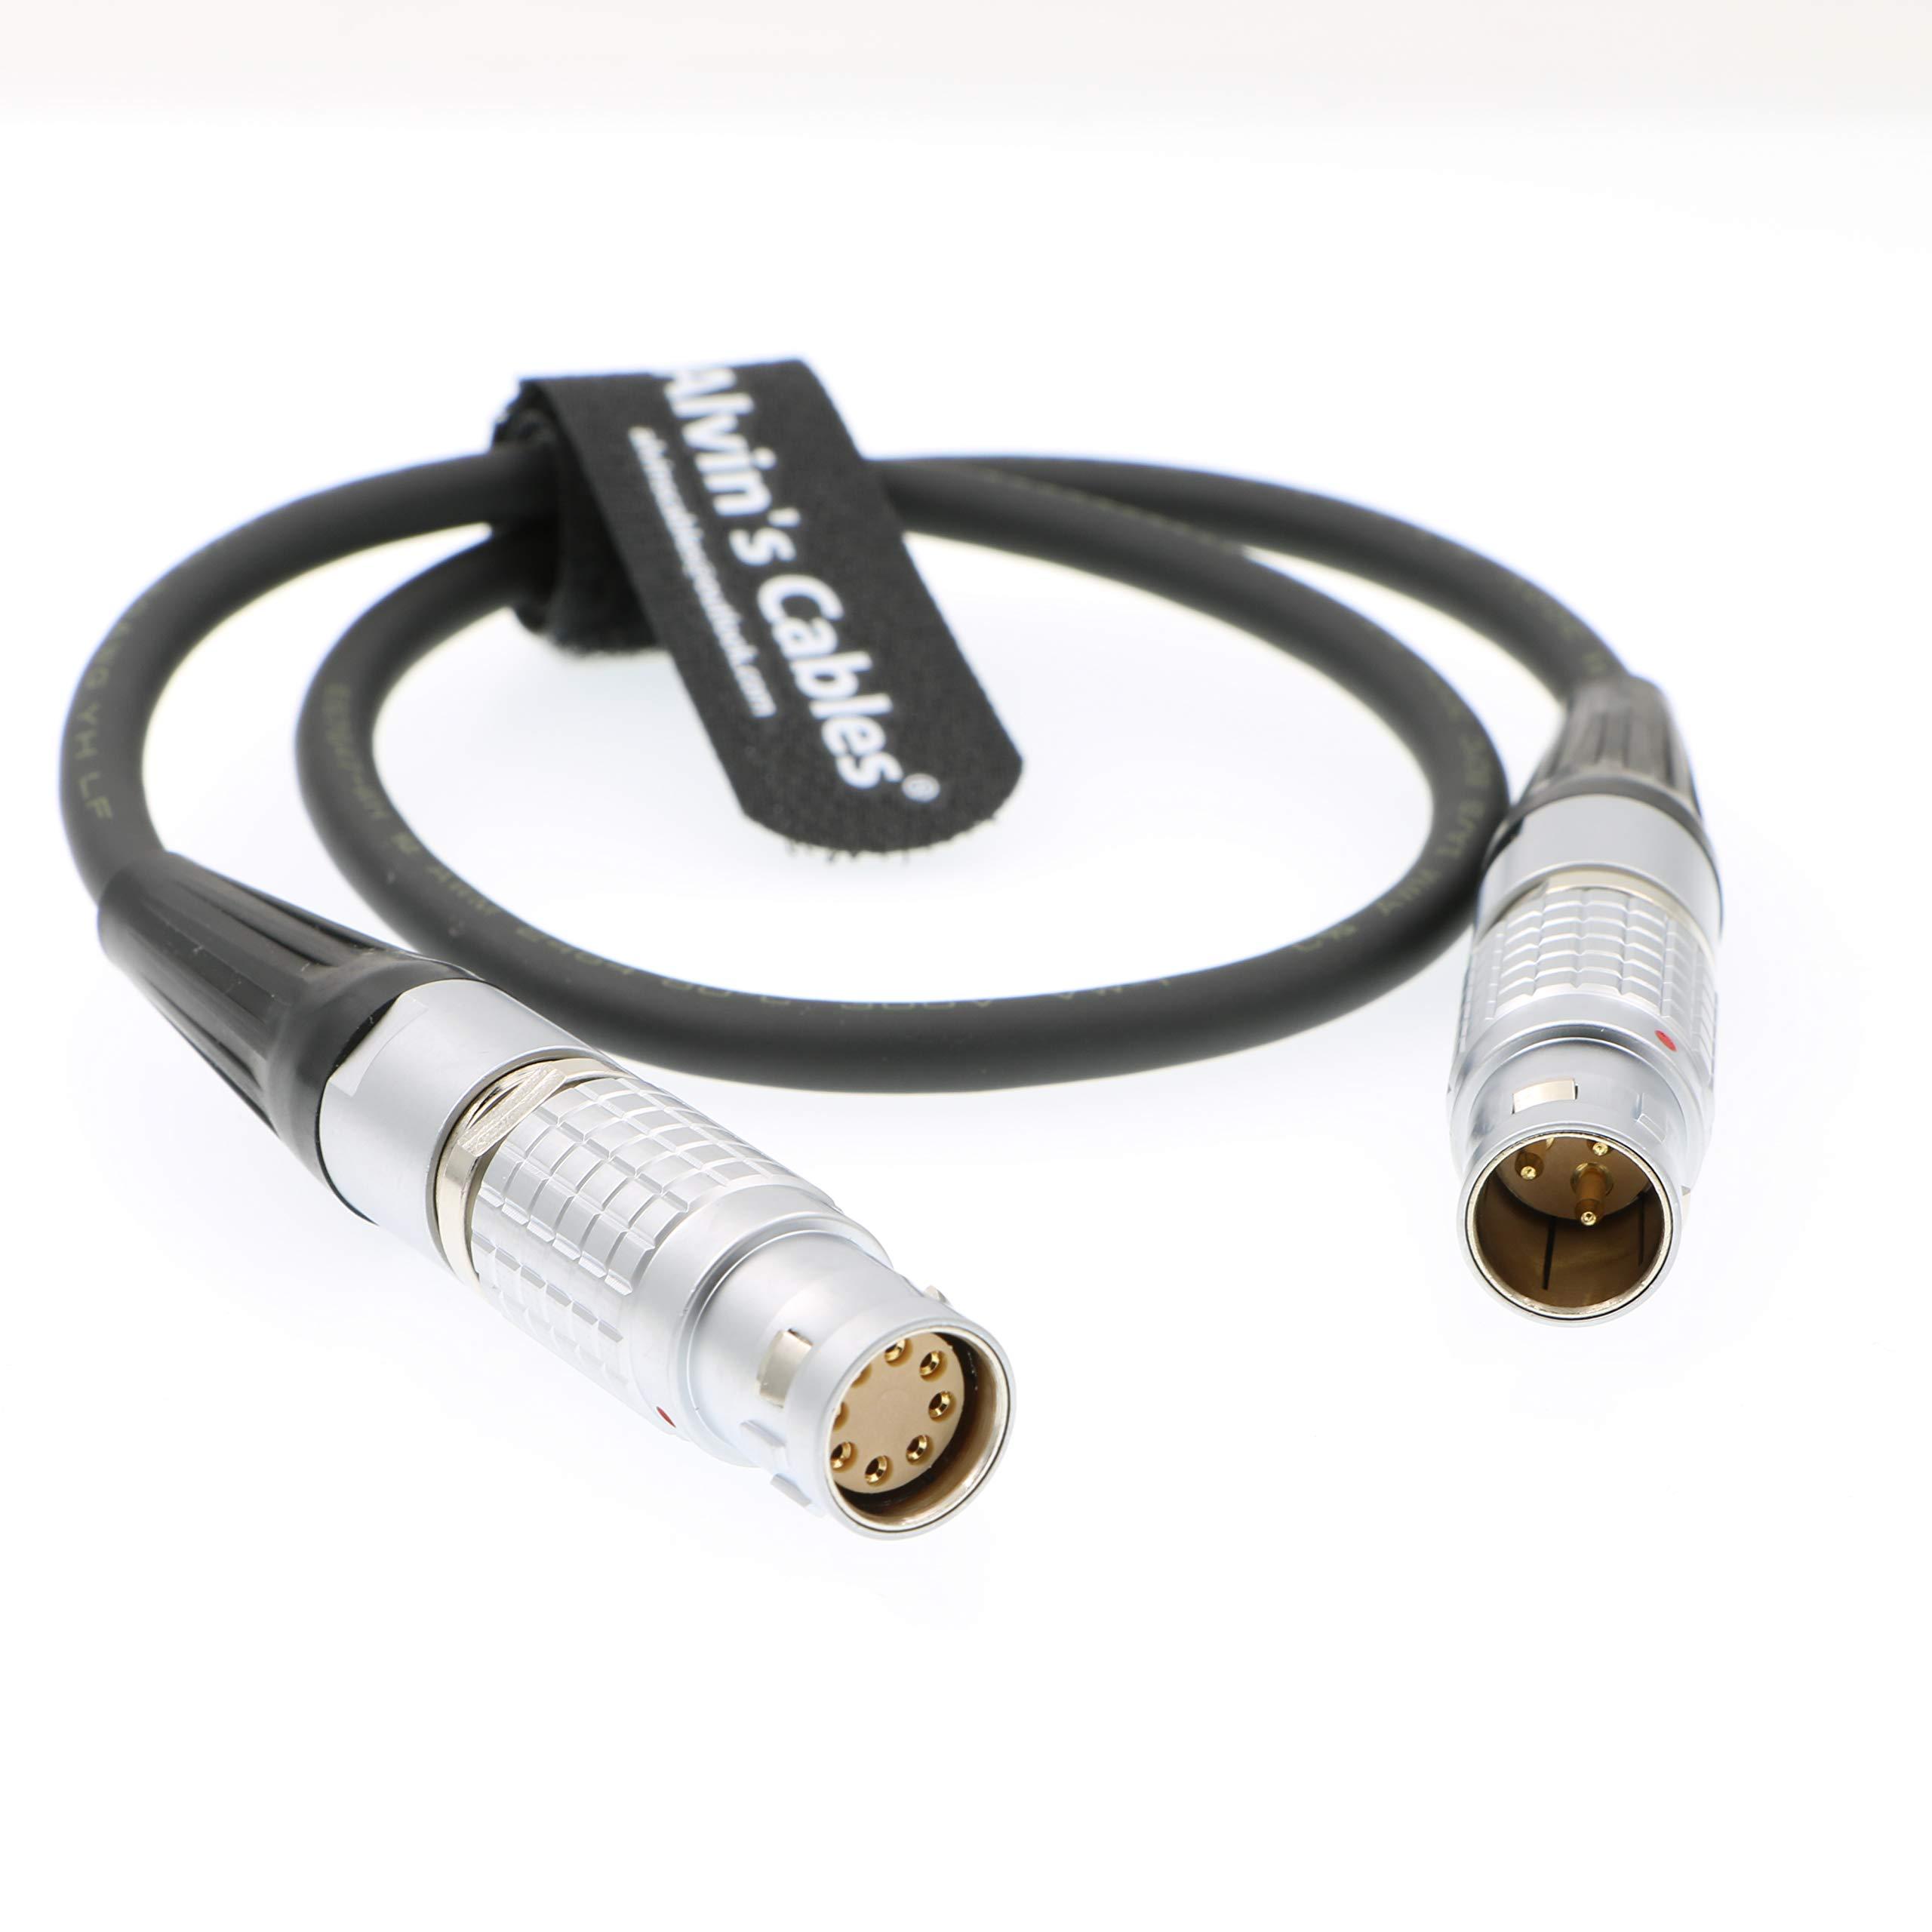 Alvin's Cables Stabilzation Tiffen Ultra 2c Steadicam M1 3 pin Male CAM PWR to Arri Alexa Mini AMIRAI 8 pin Female Power Cable